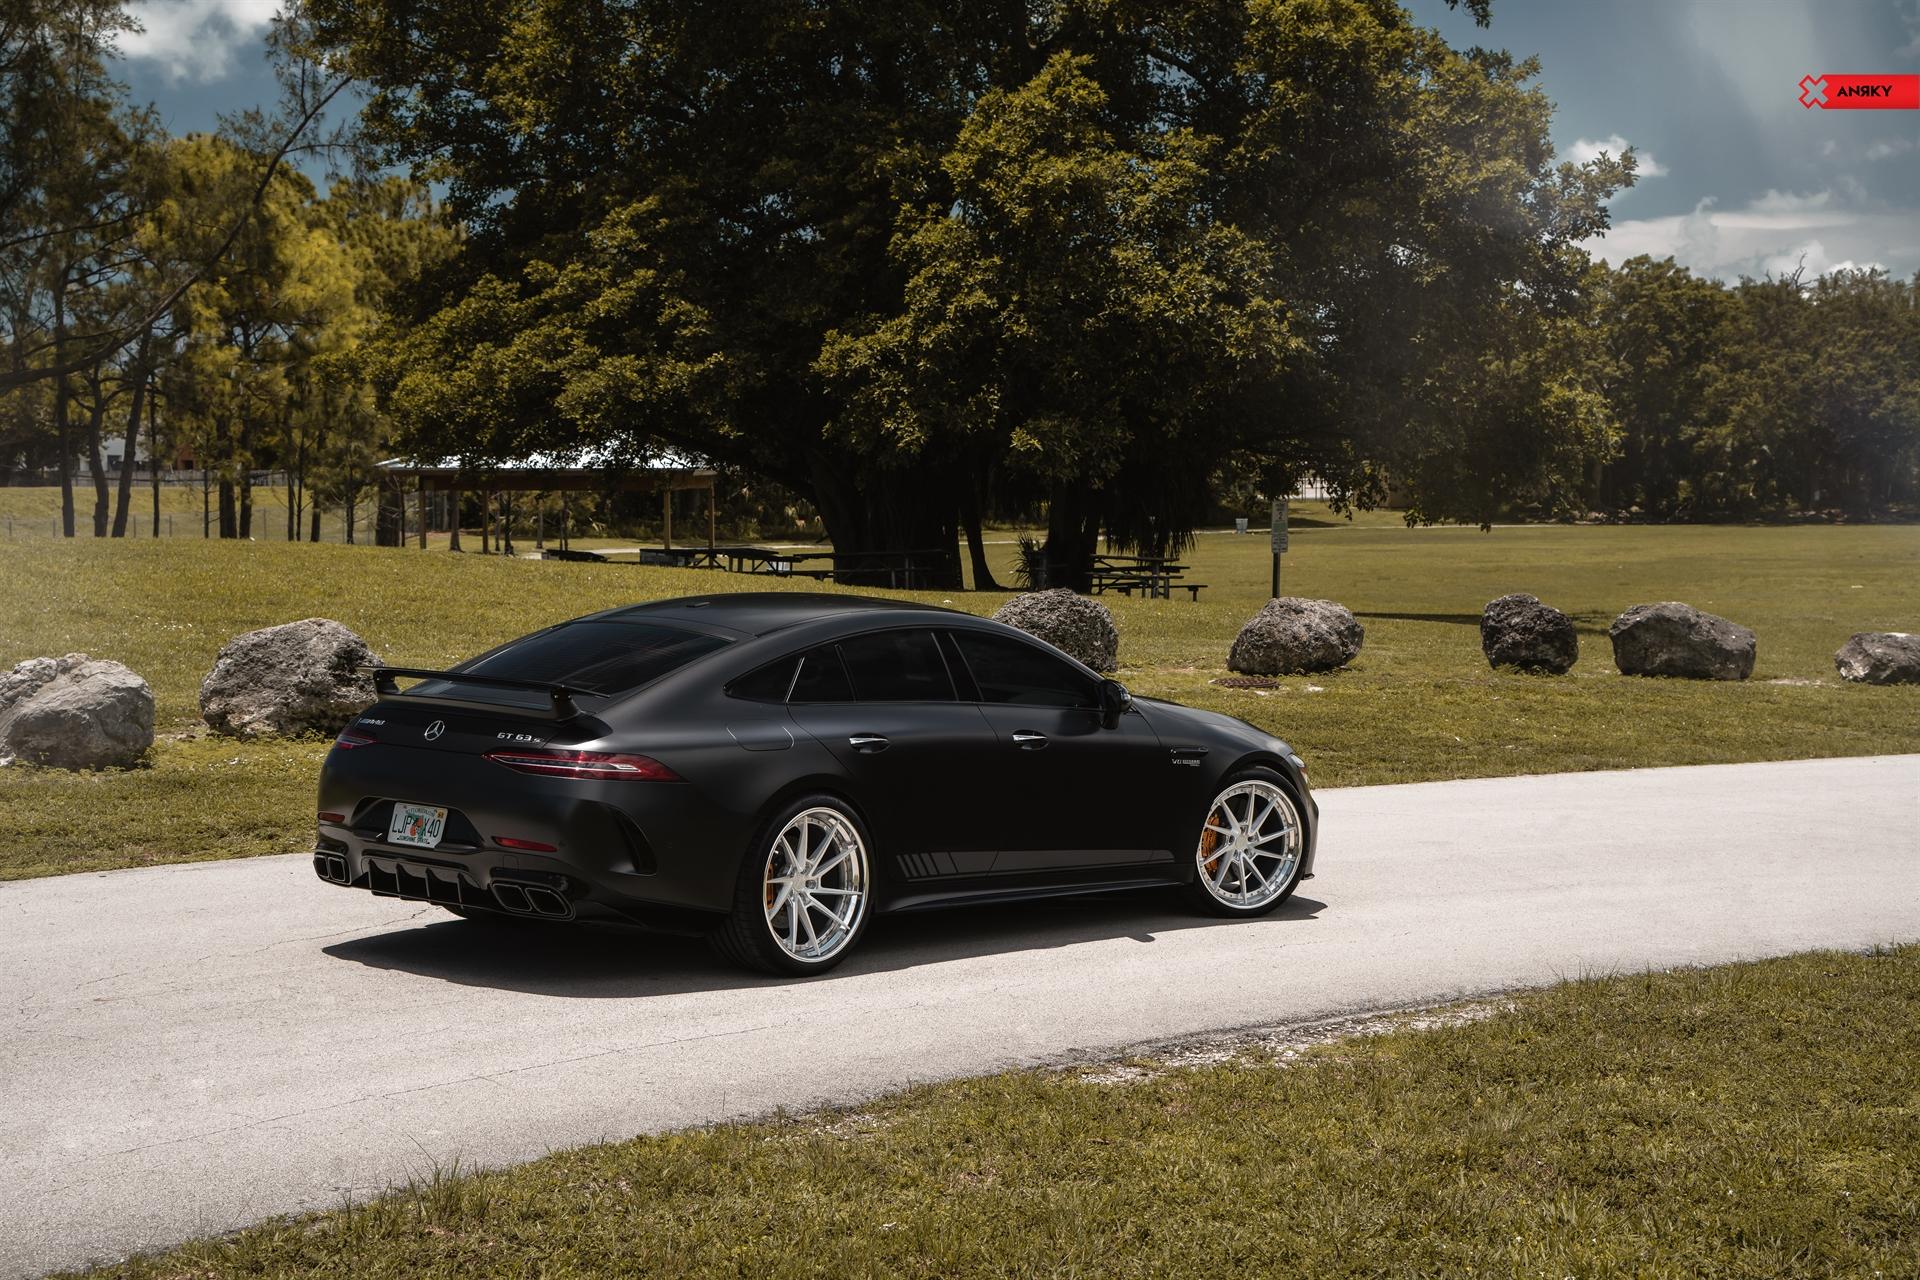 Black Rolls Royce >> Mercedes Benz AMG GT63s - AN33 SeriesTHREE | Anrky Wheels